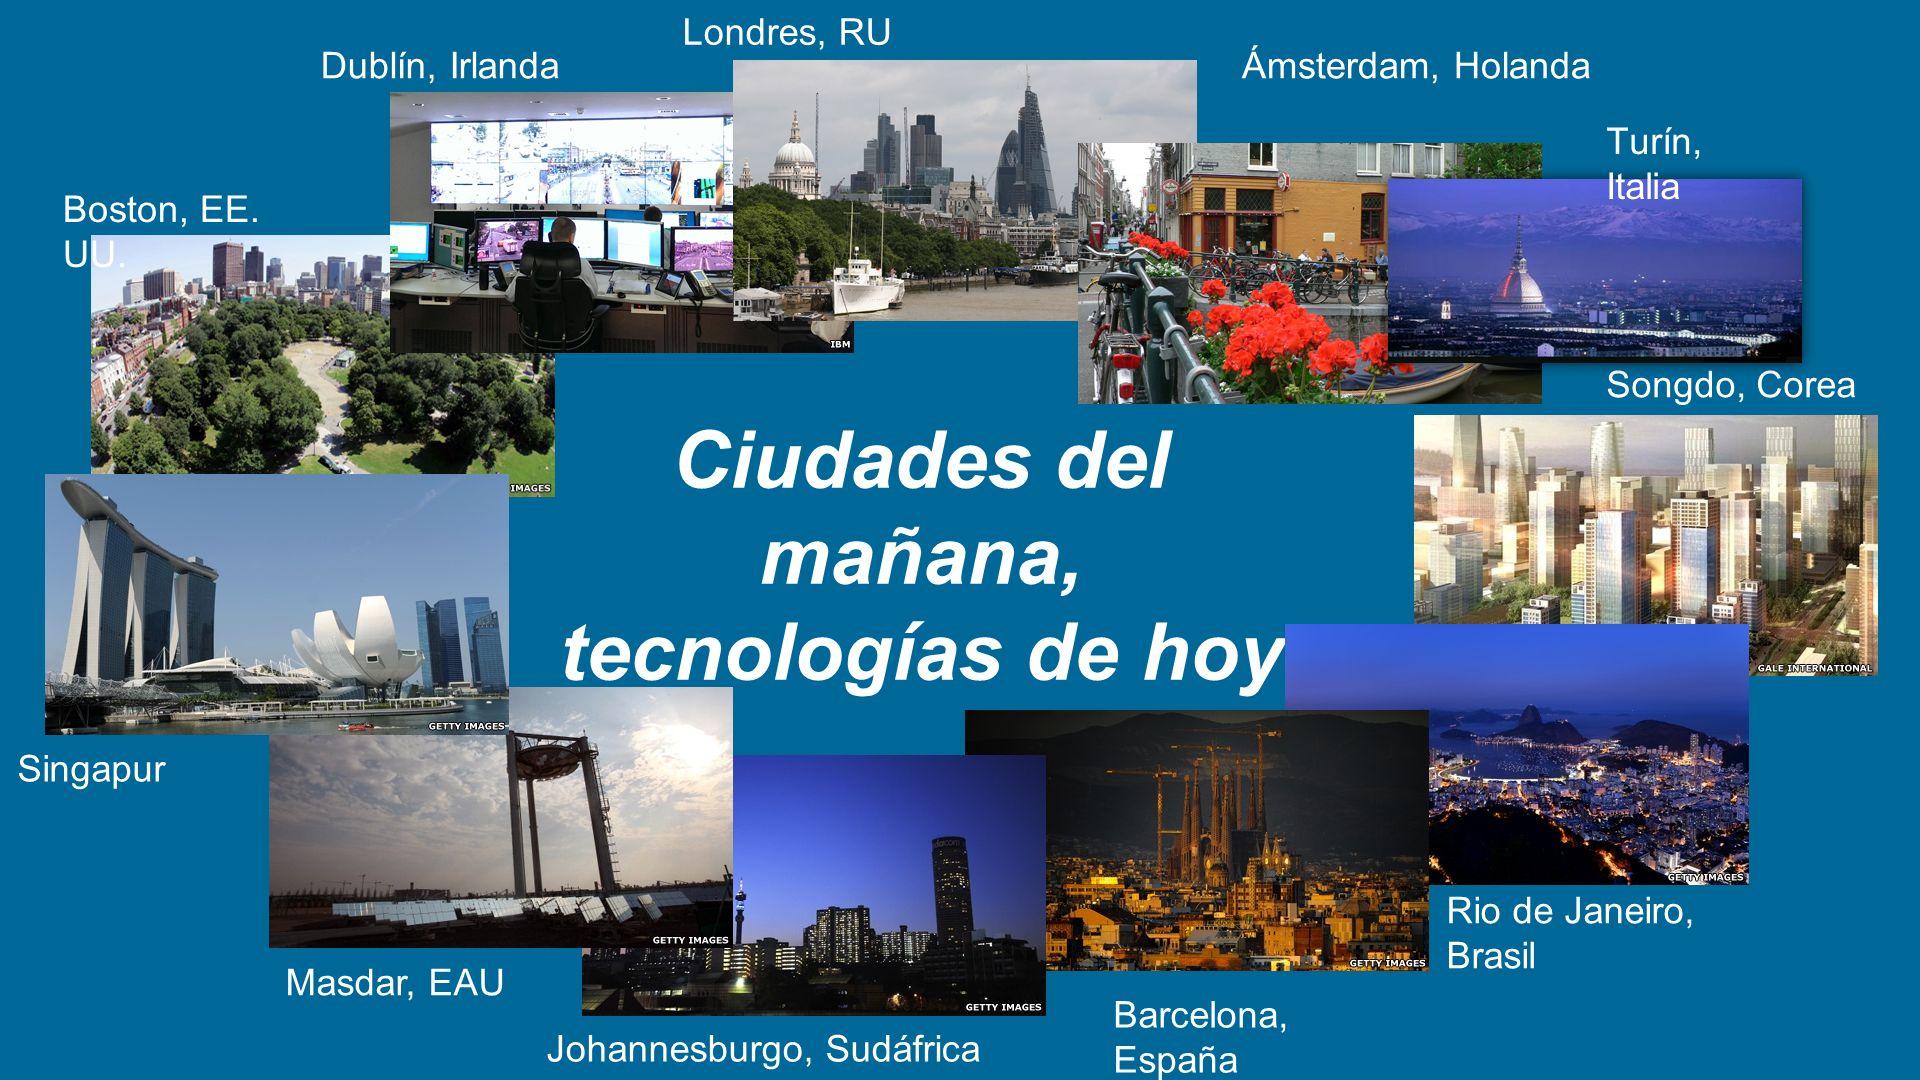 Ciudades del mañana, tecnologías de hoy